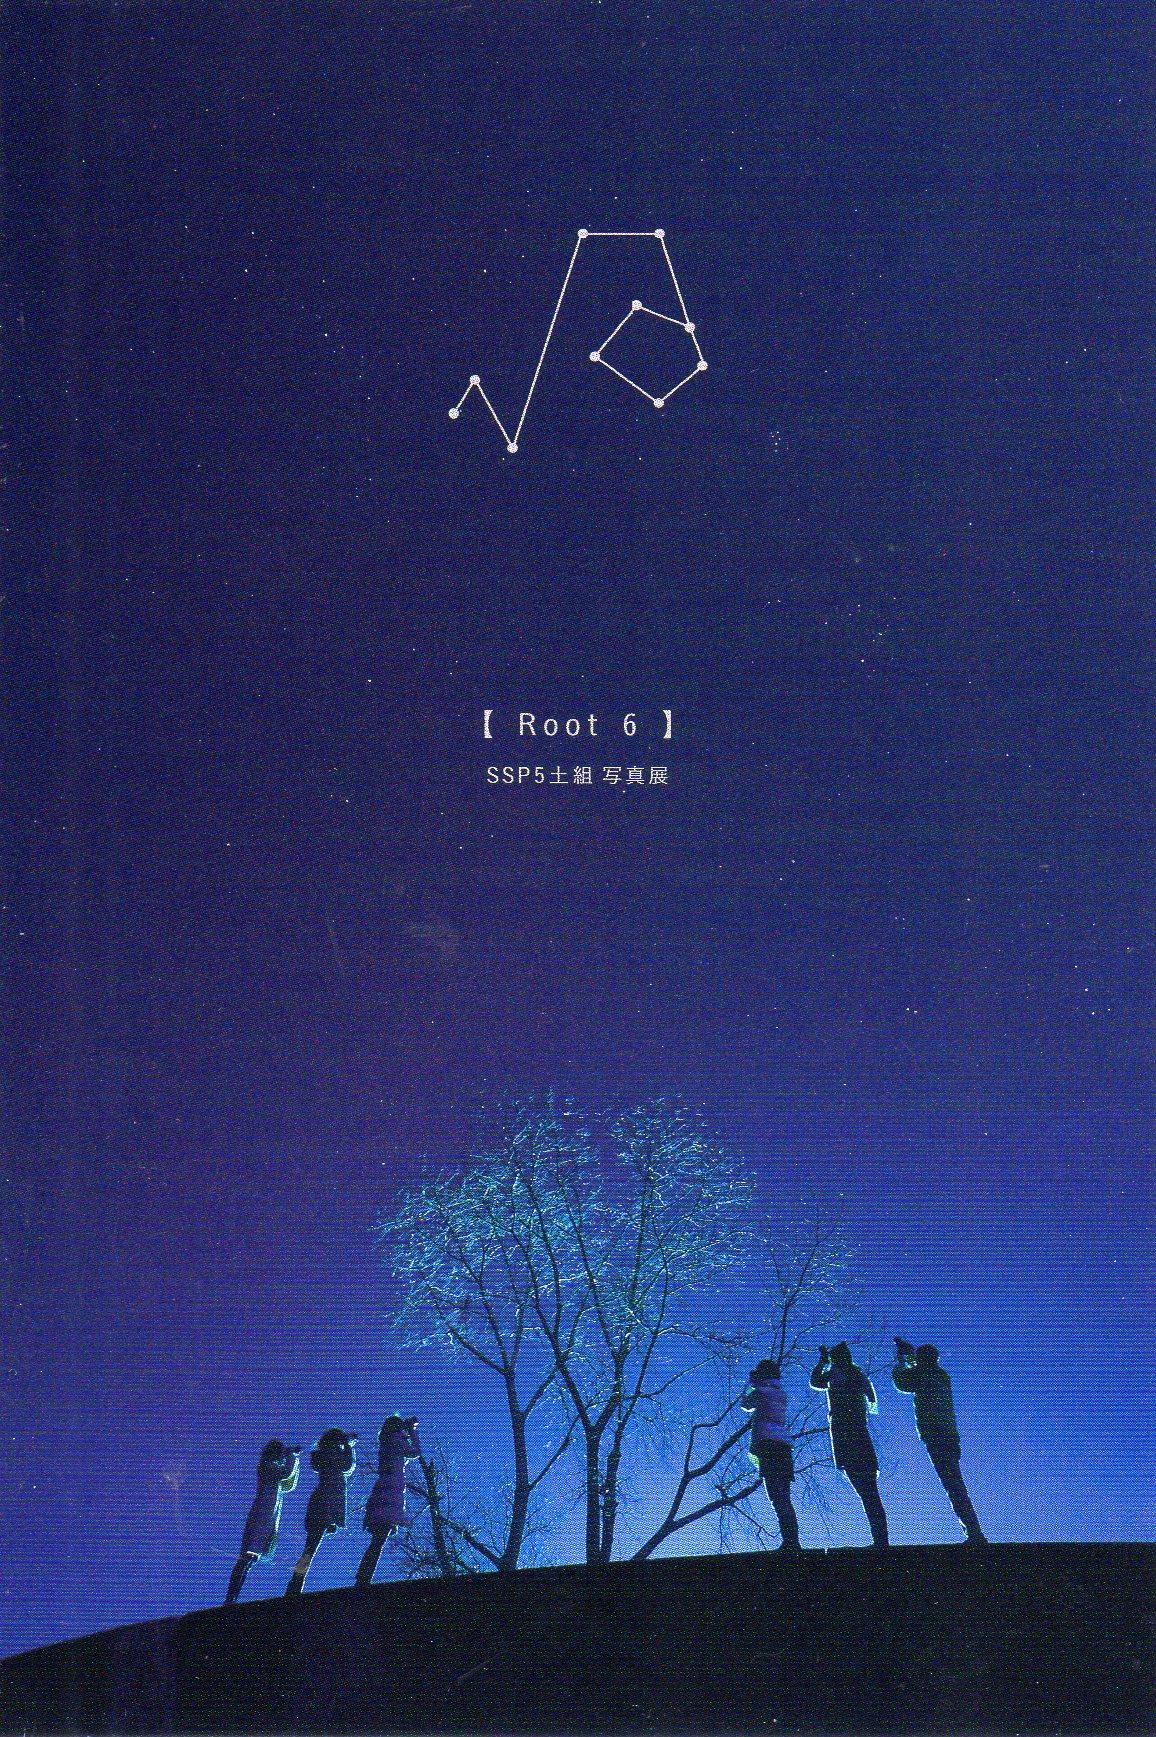 【Root6】SSP5 土組写真展